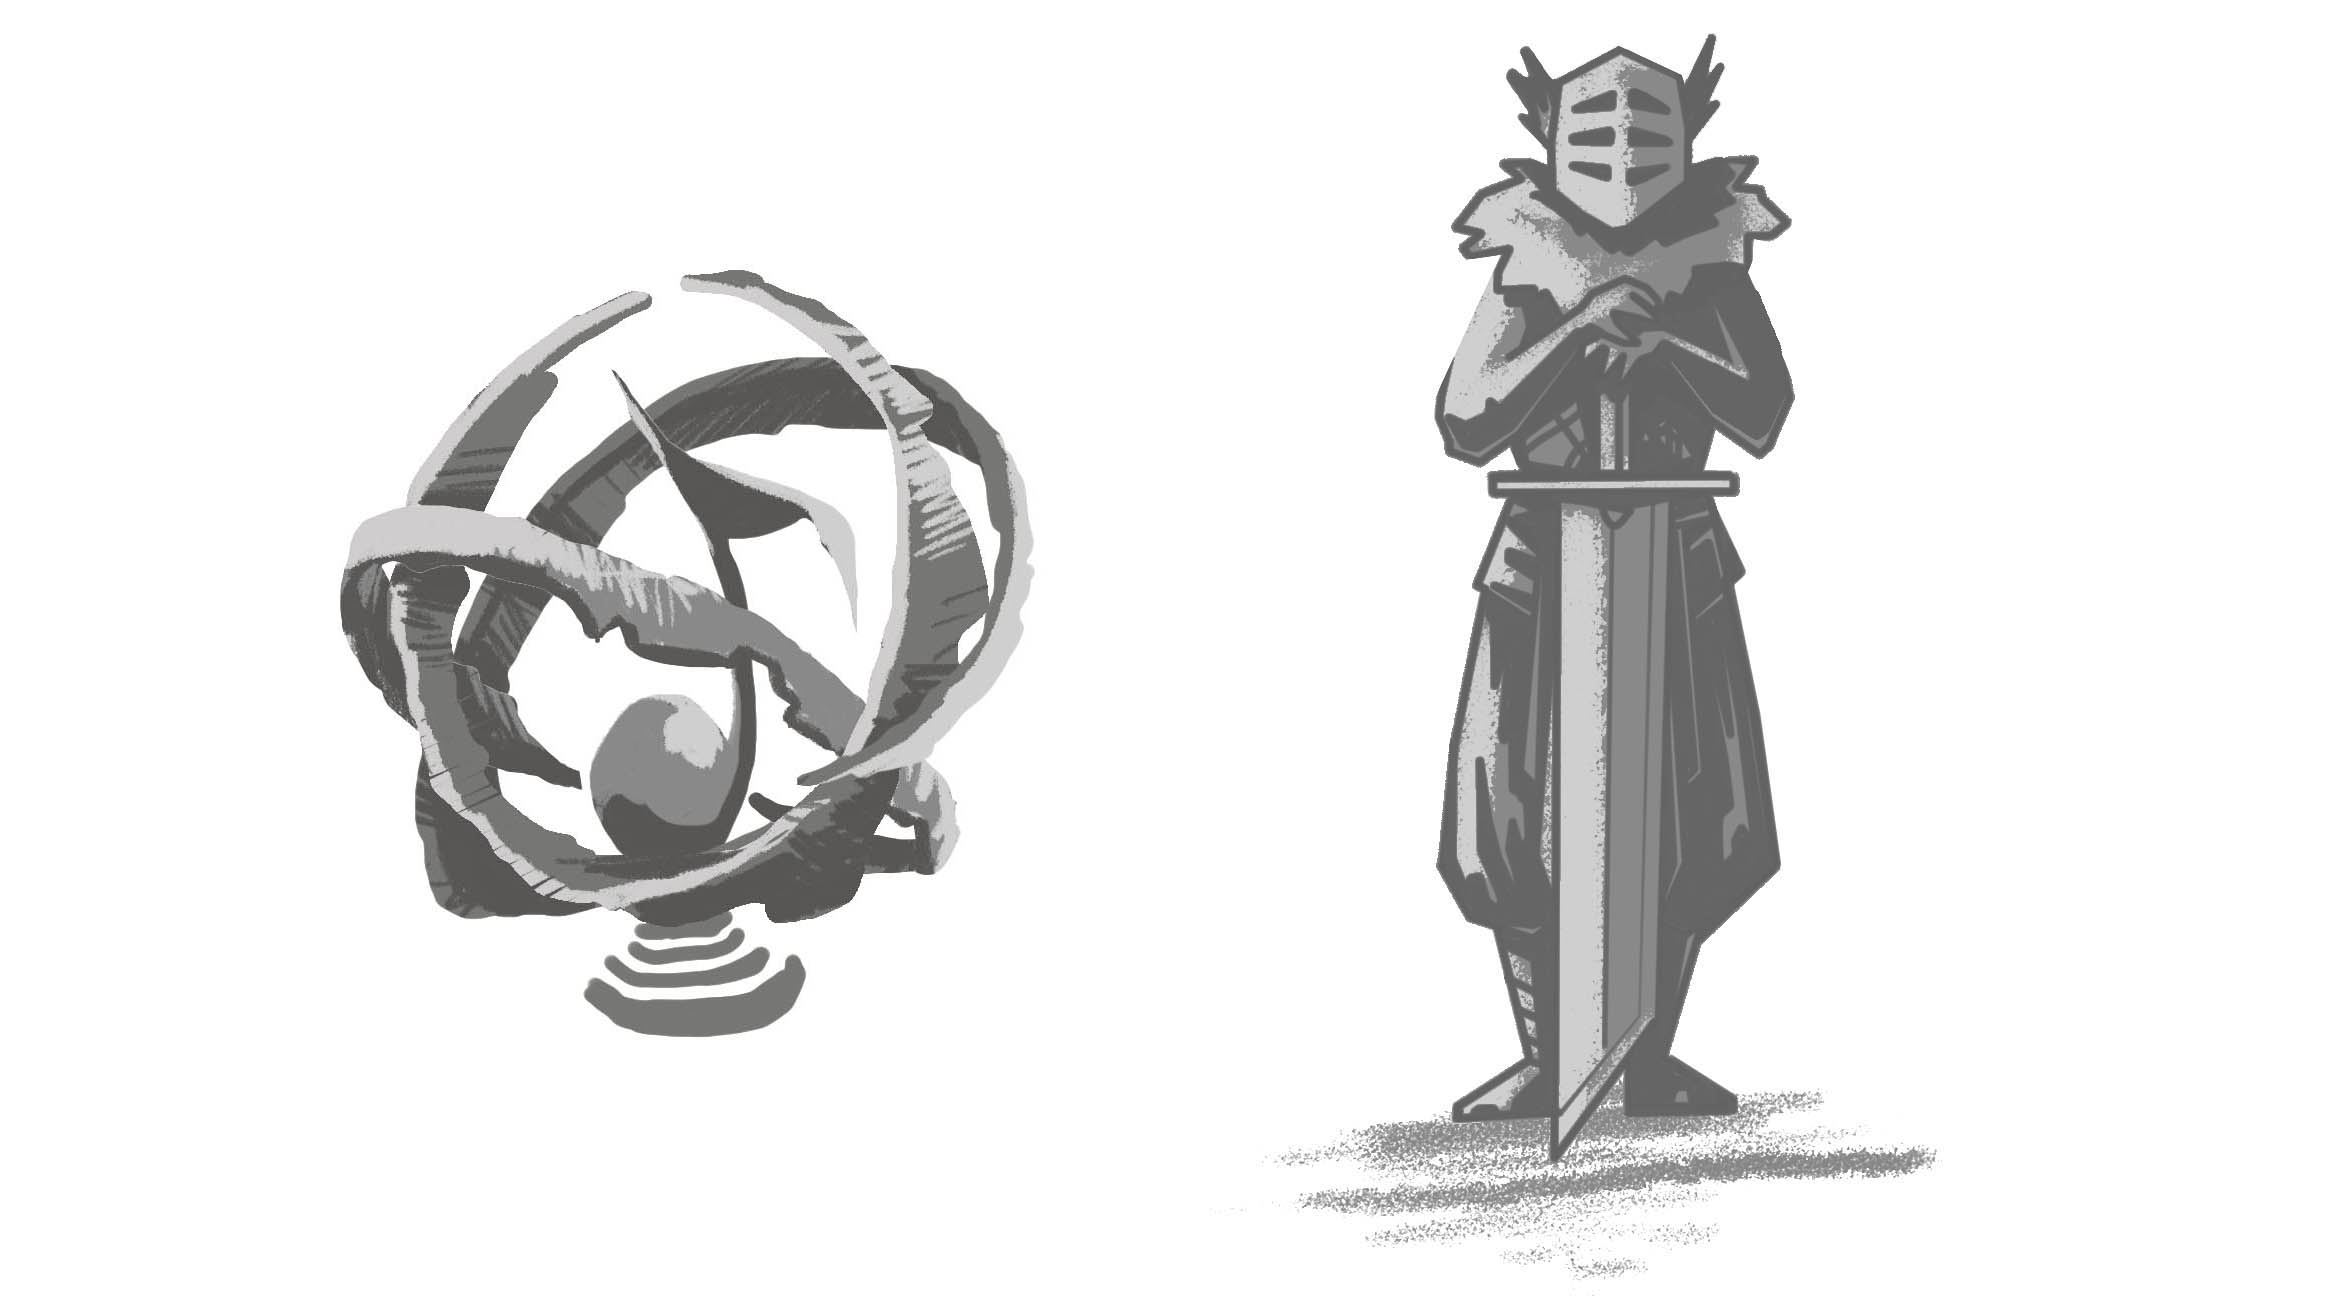 abys-illustration da-lyon rough fantasy